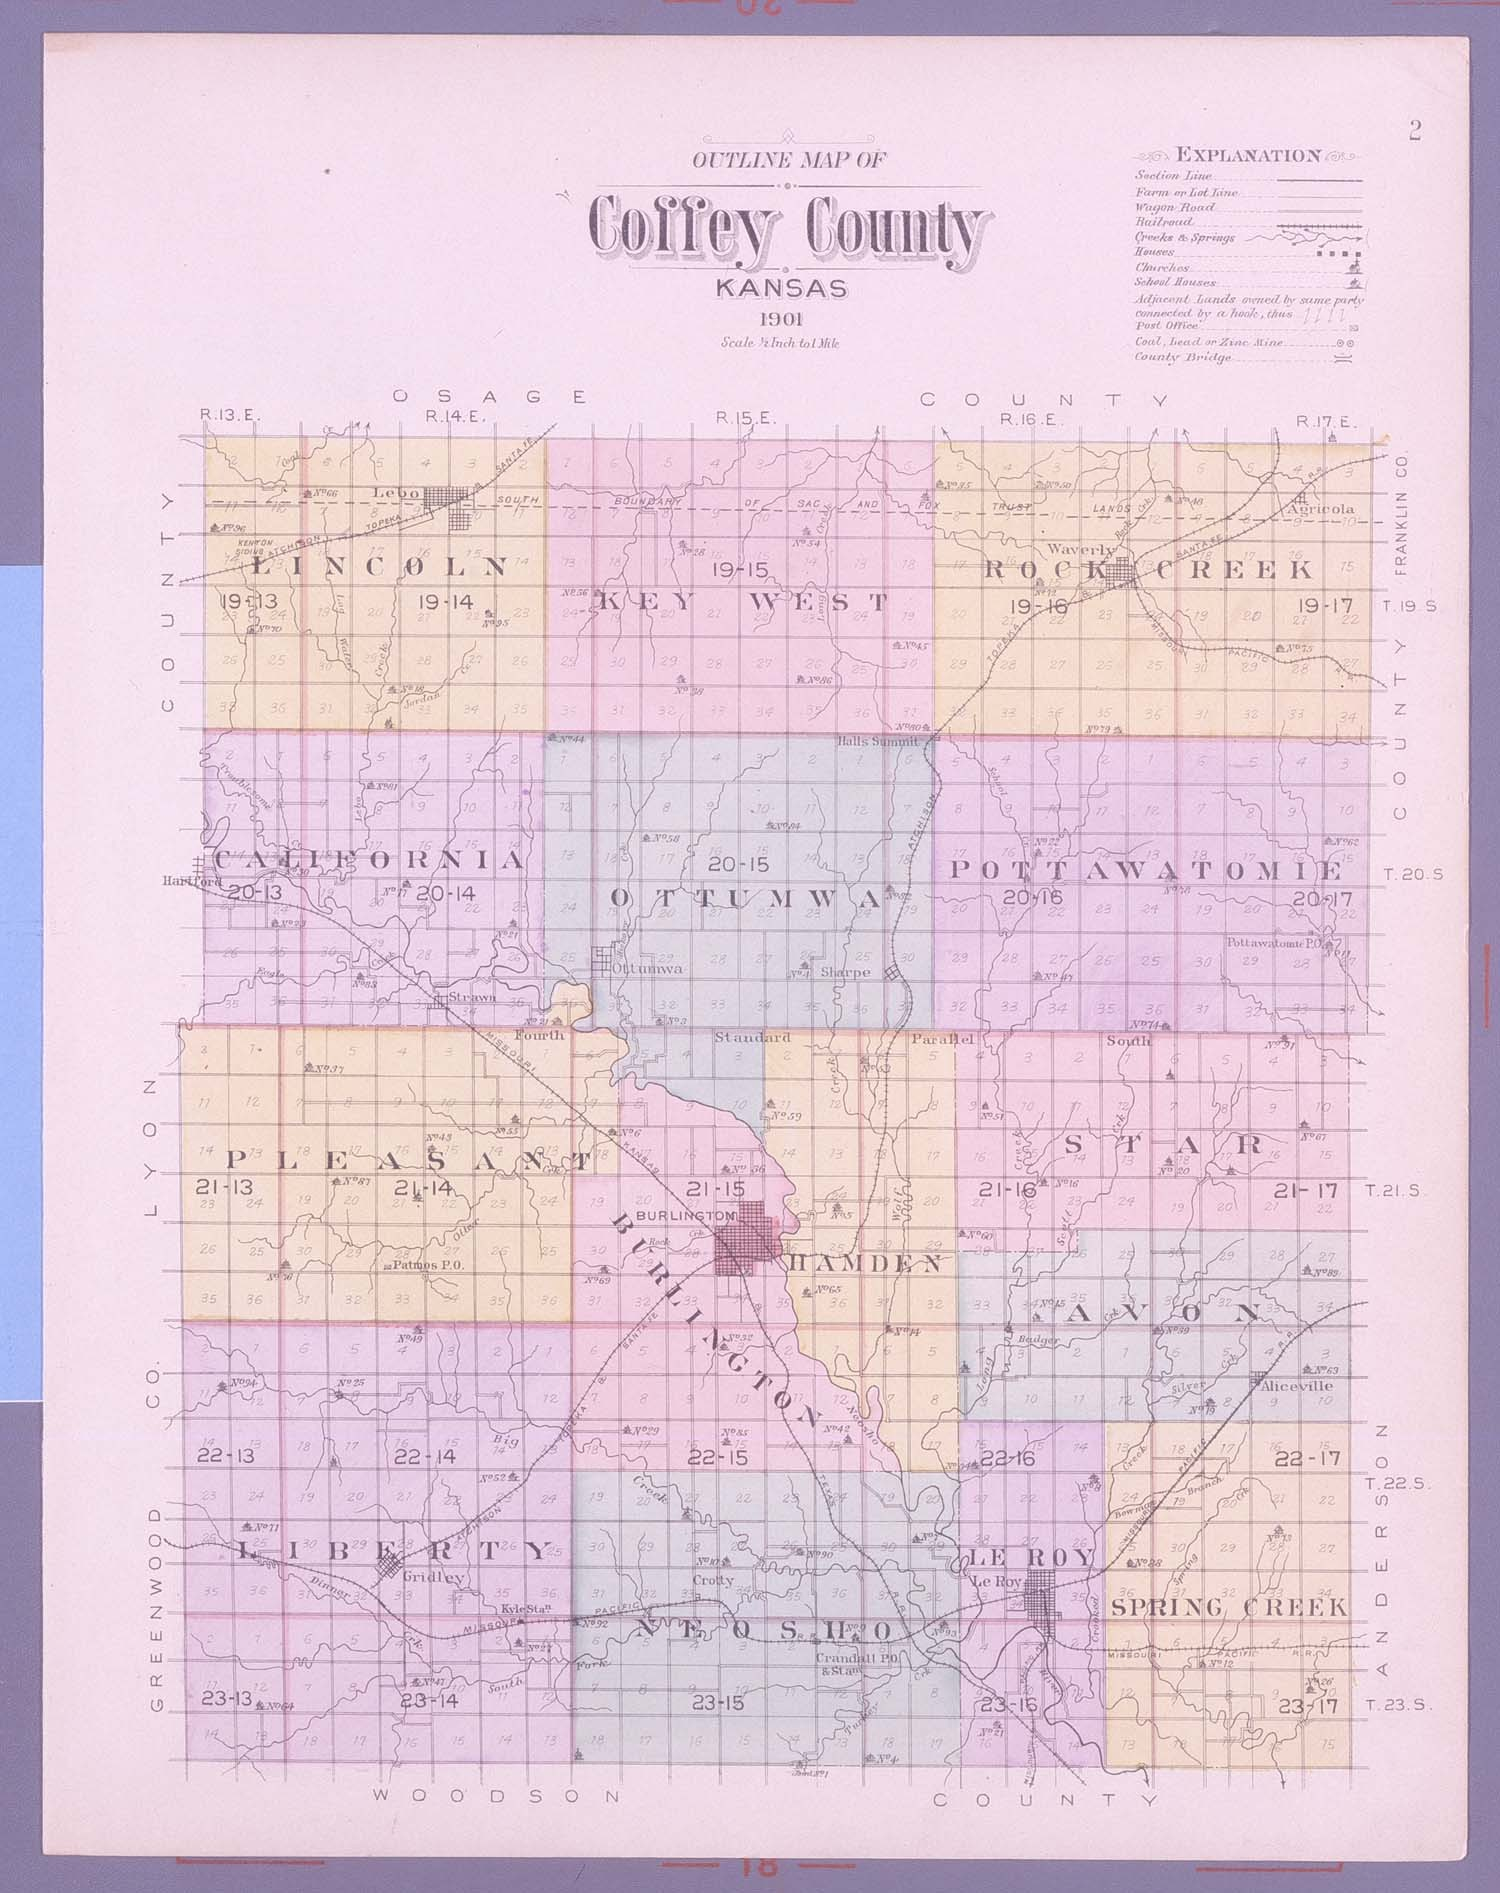 Plat book, Coffey County, Kansas - 2